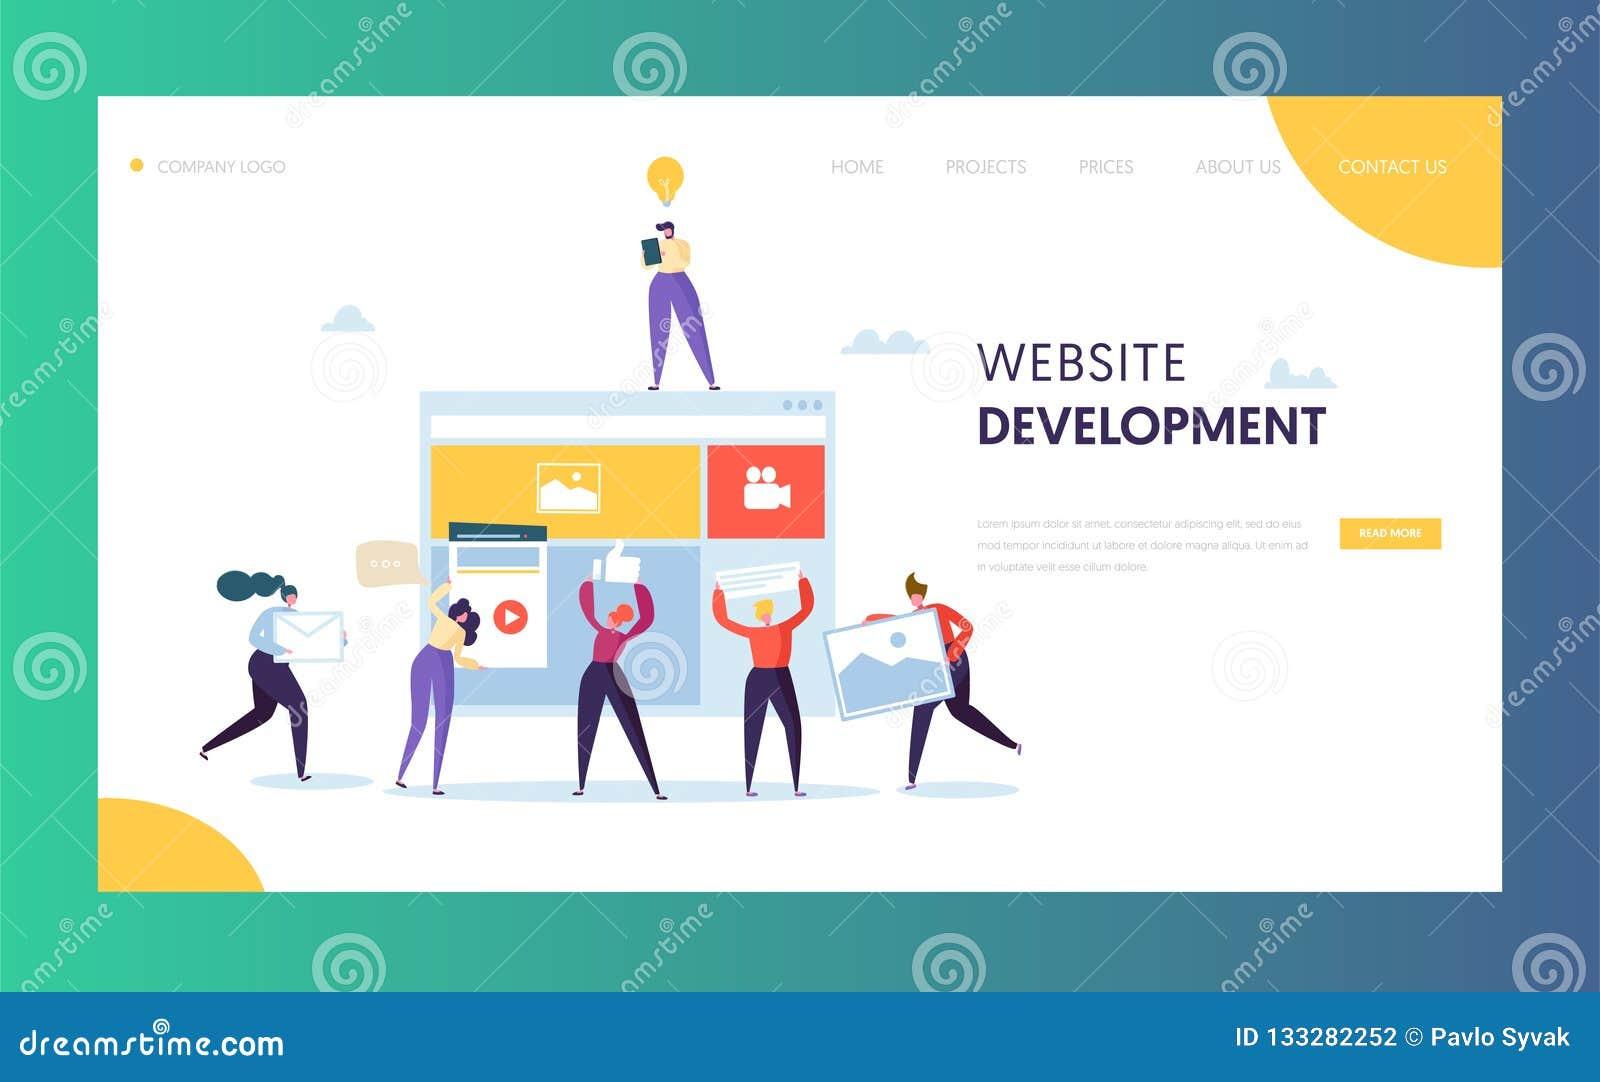 Web Development landing page template. Flat People